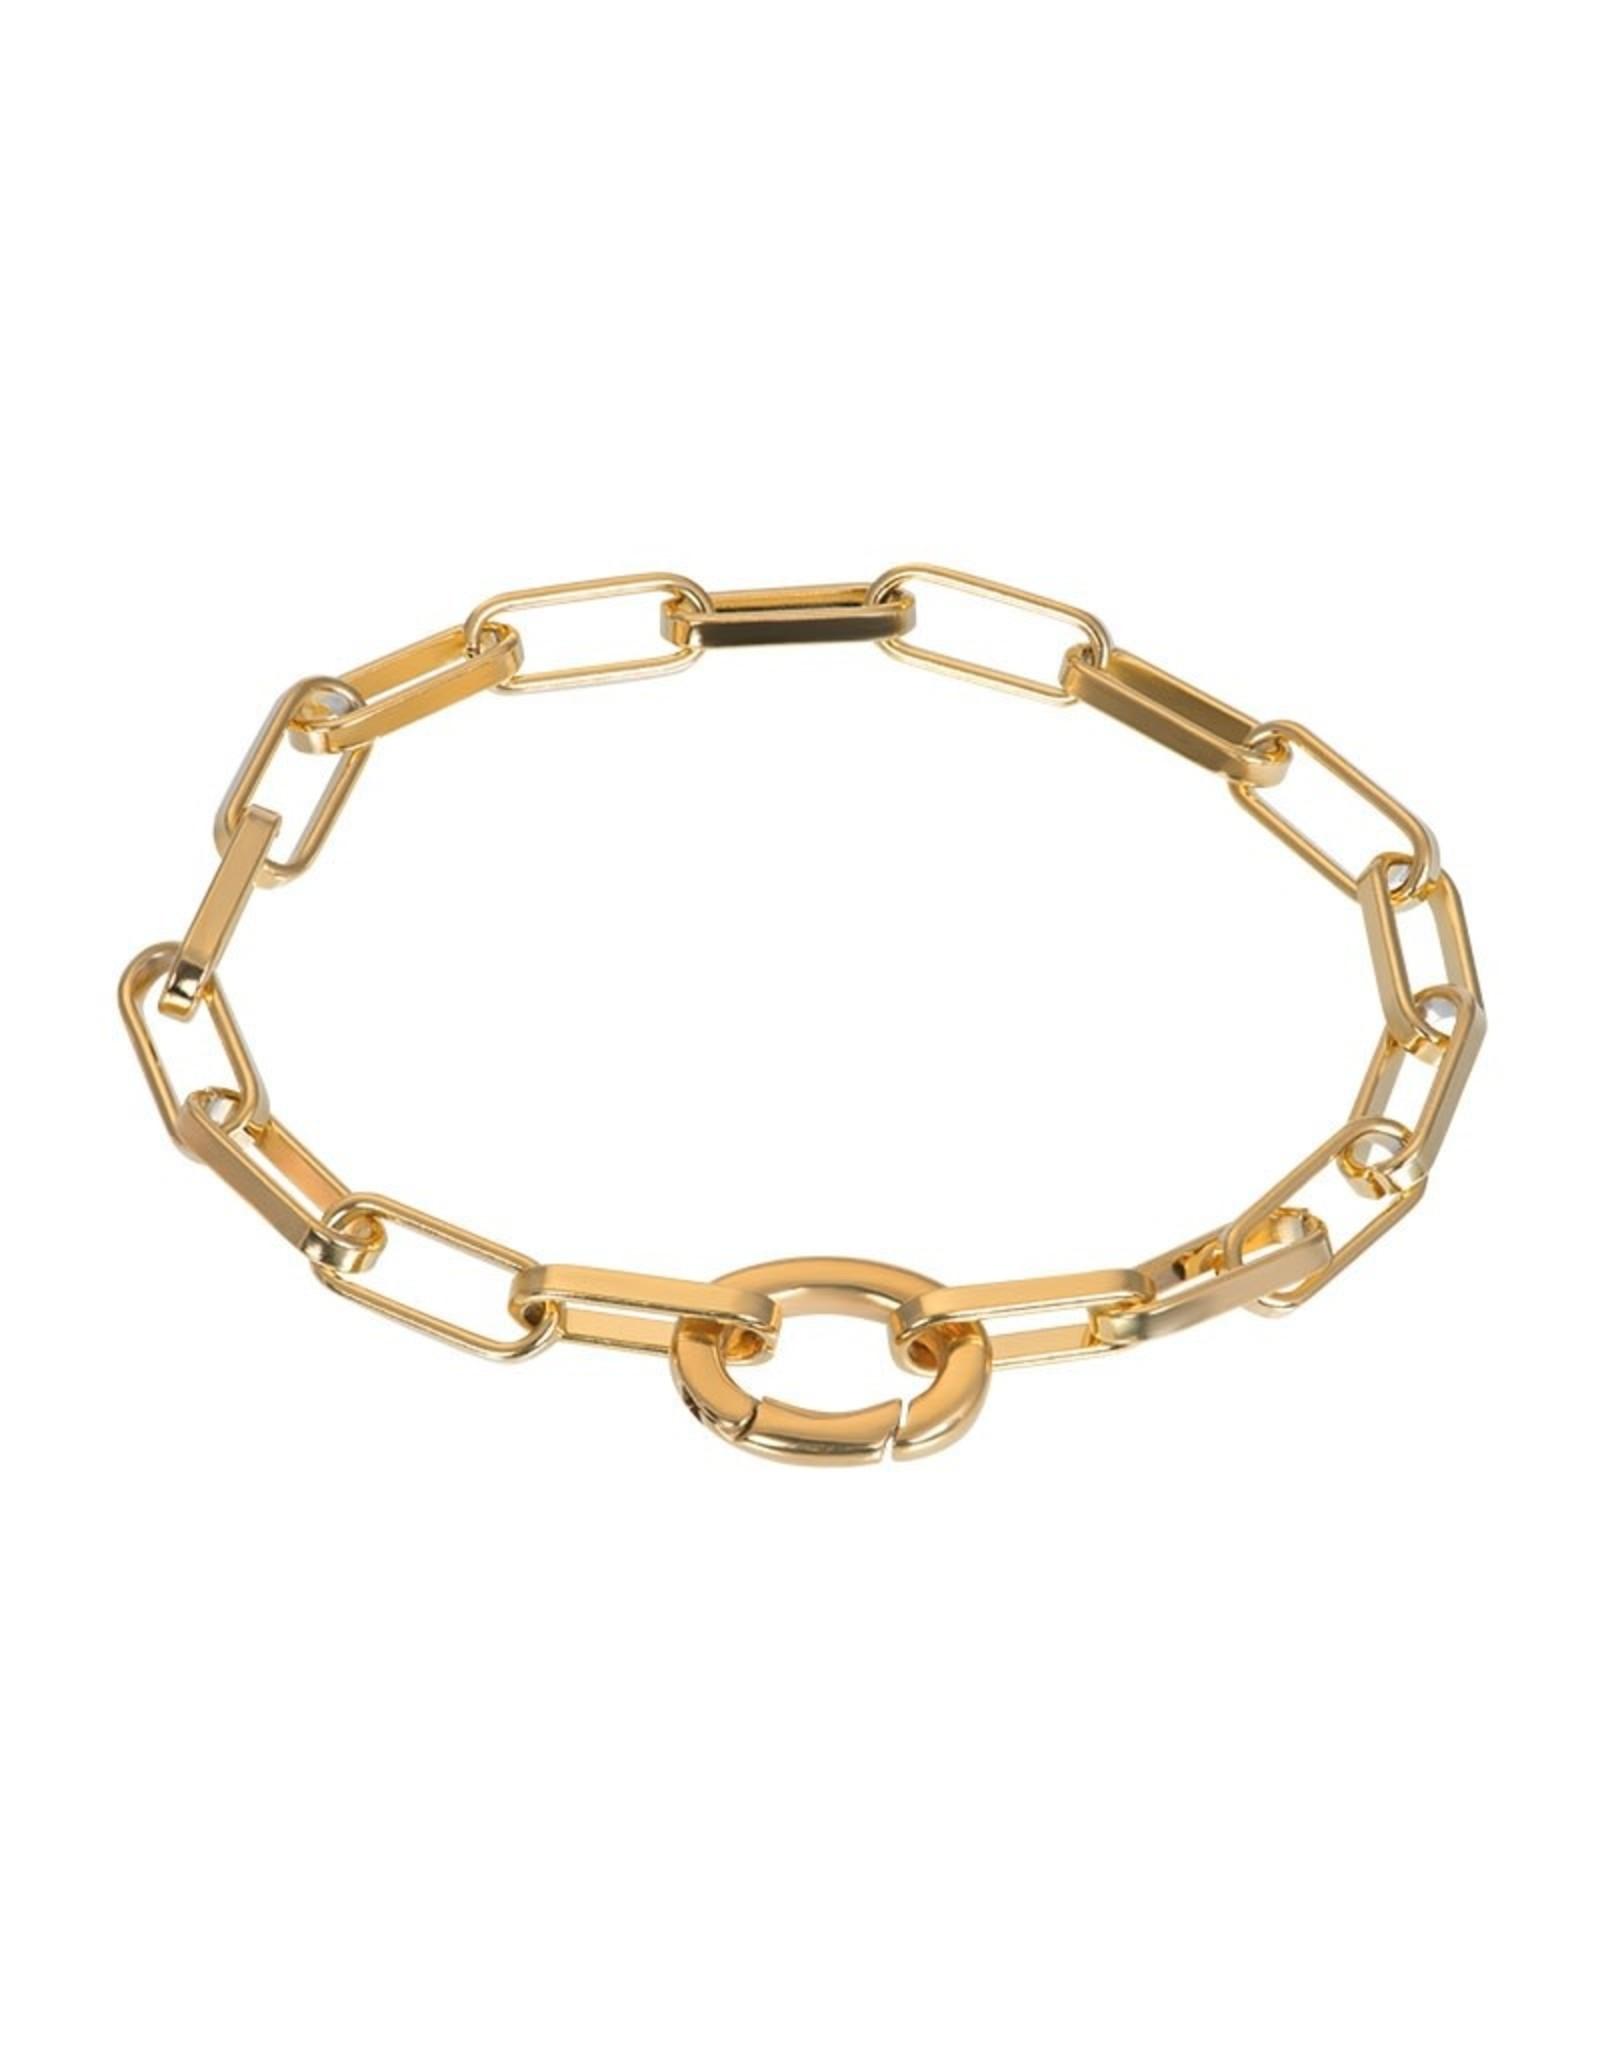 IXXXI IXXXI Bracelet Square Chain Gold